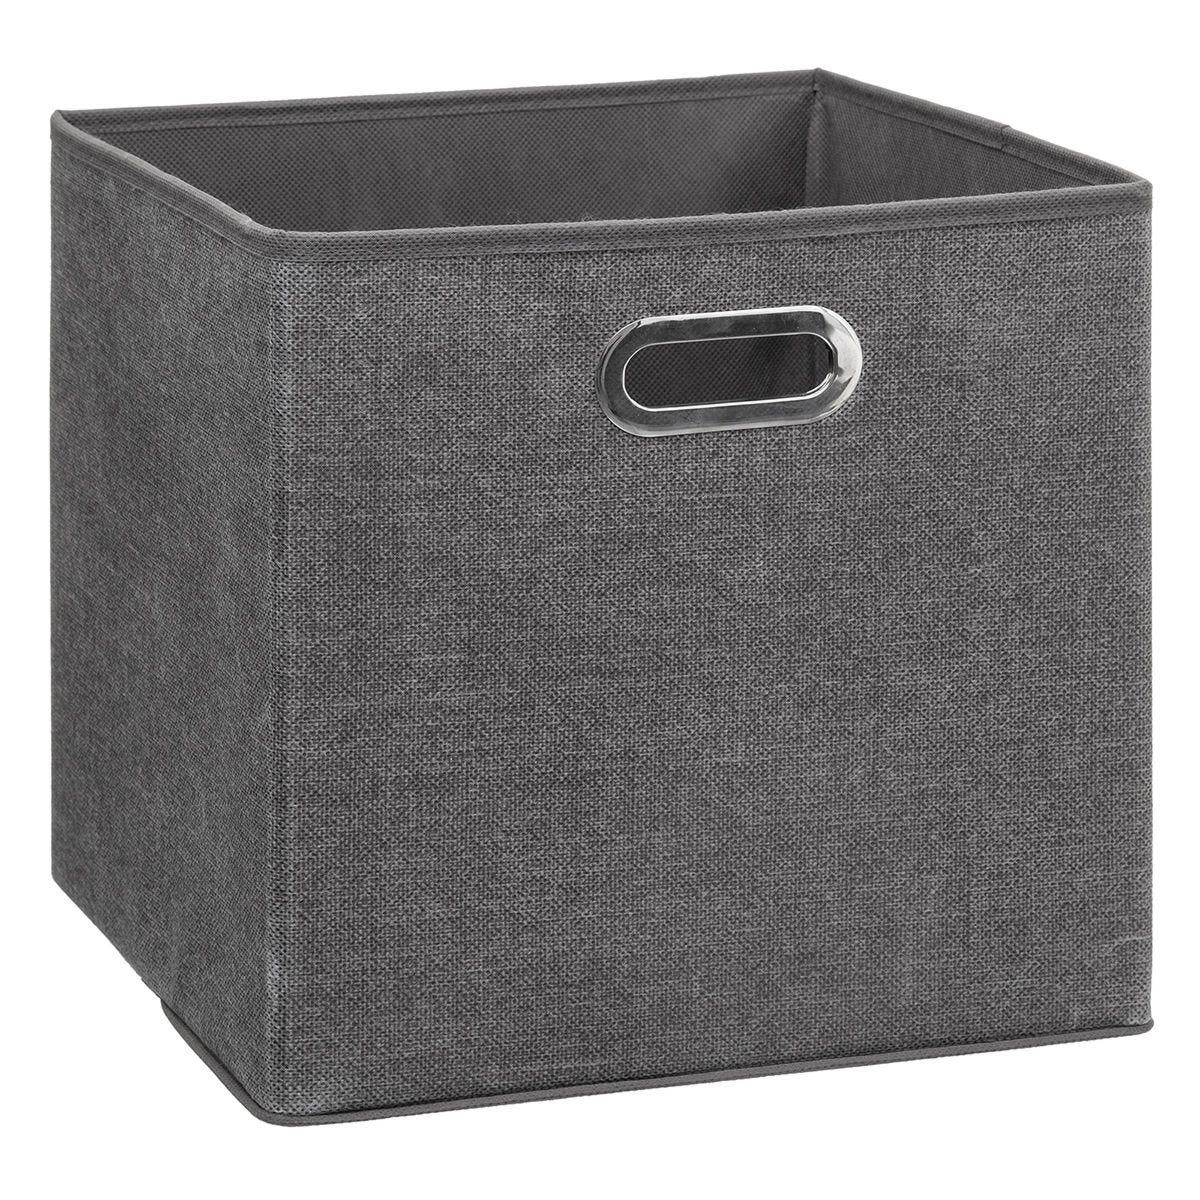 5Five Pair Fabric Basket 31 x 31cm - Dark Grey